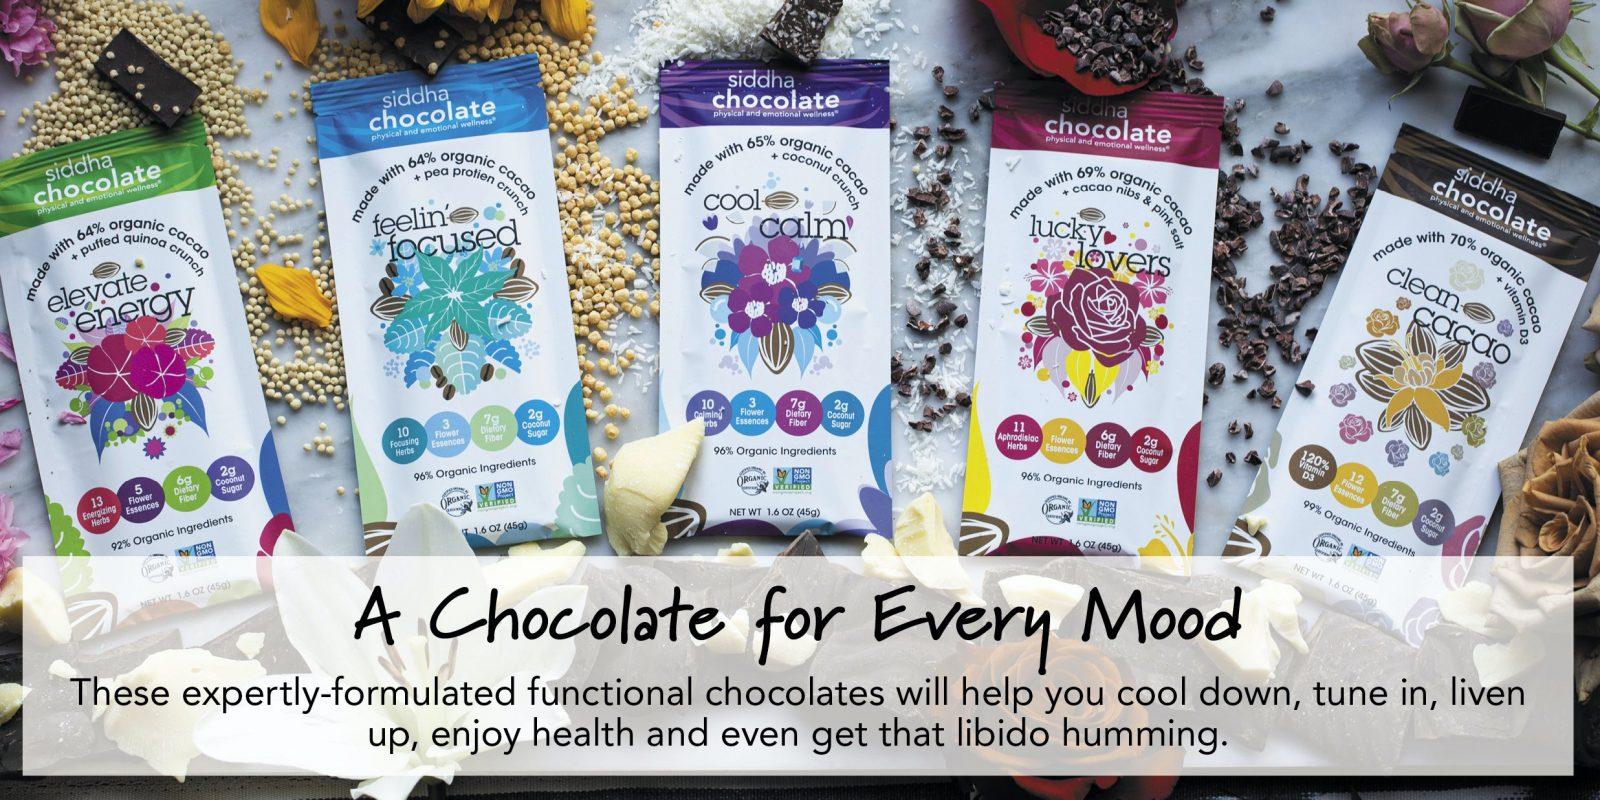 Chocolate for every mood